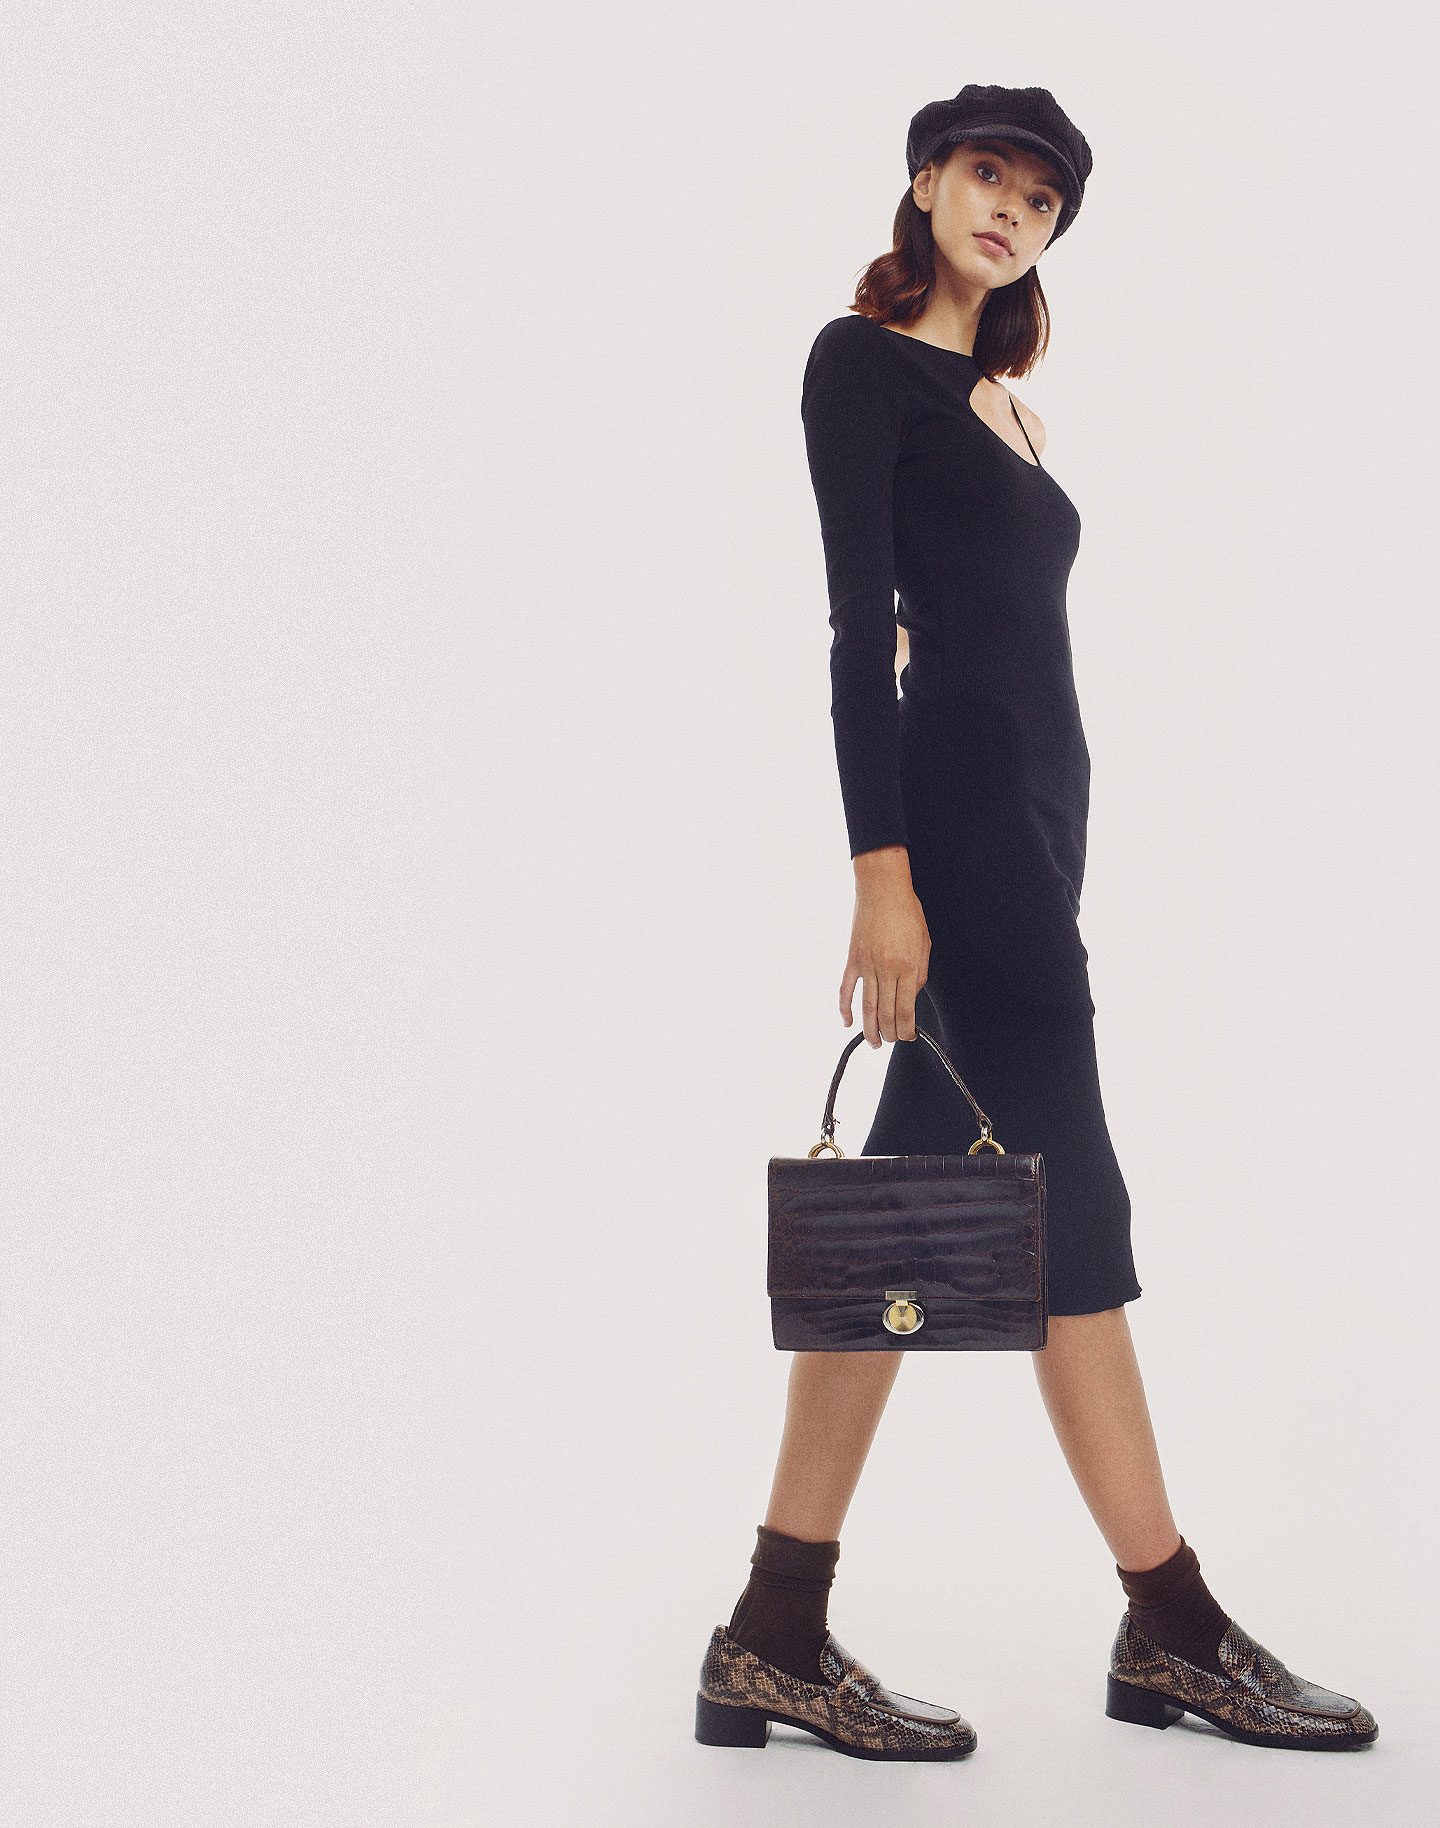 Lookbook Corina Shoes 21 - 8